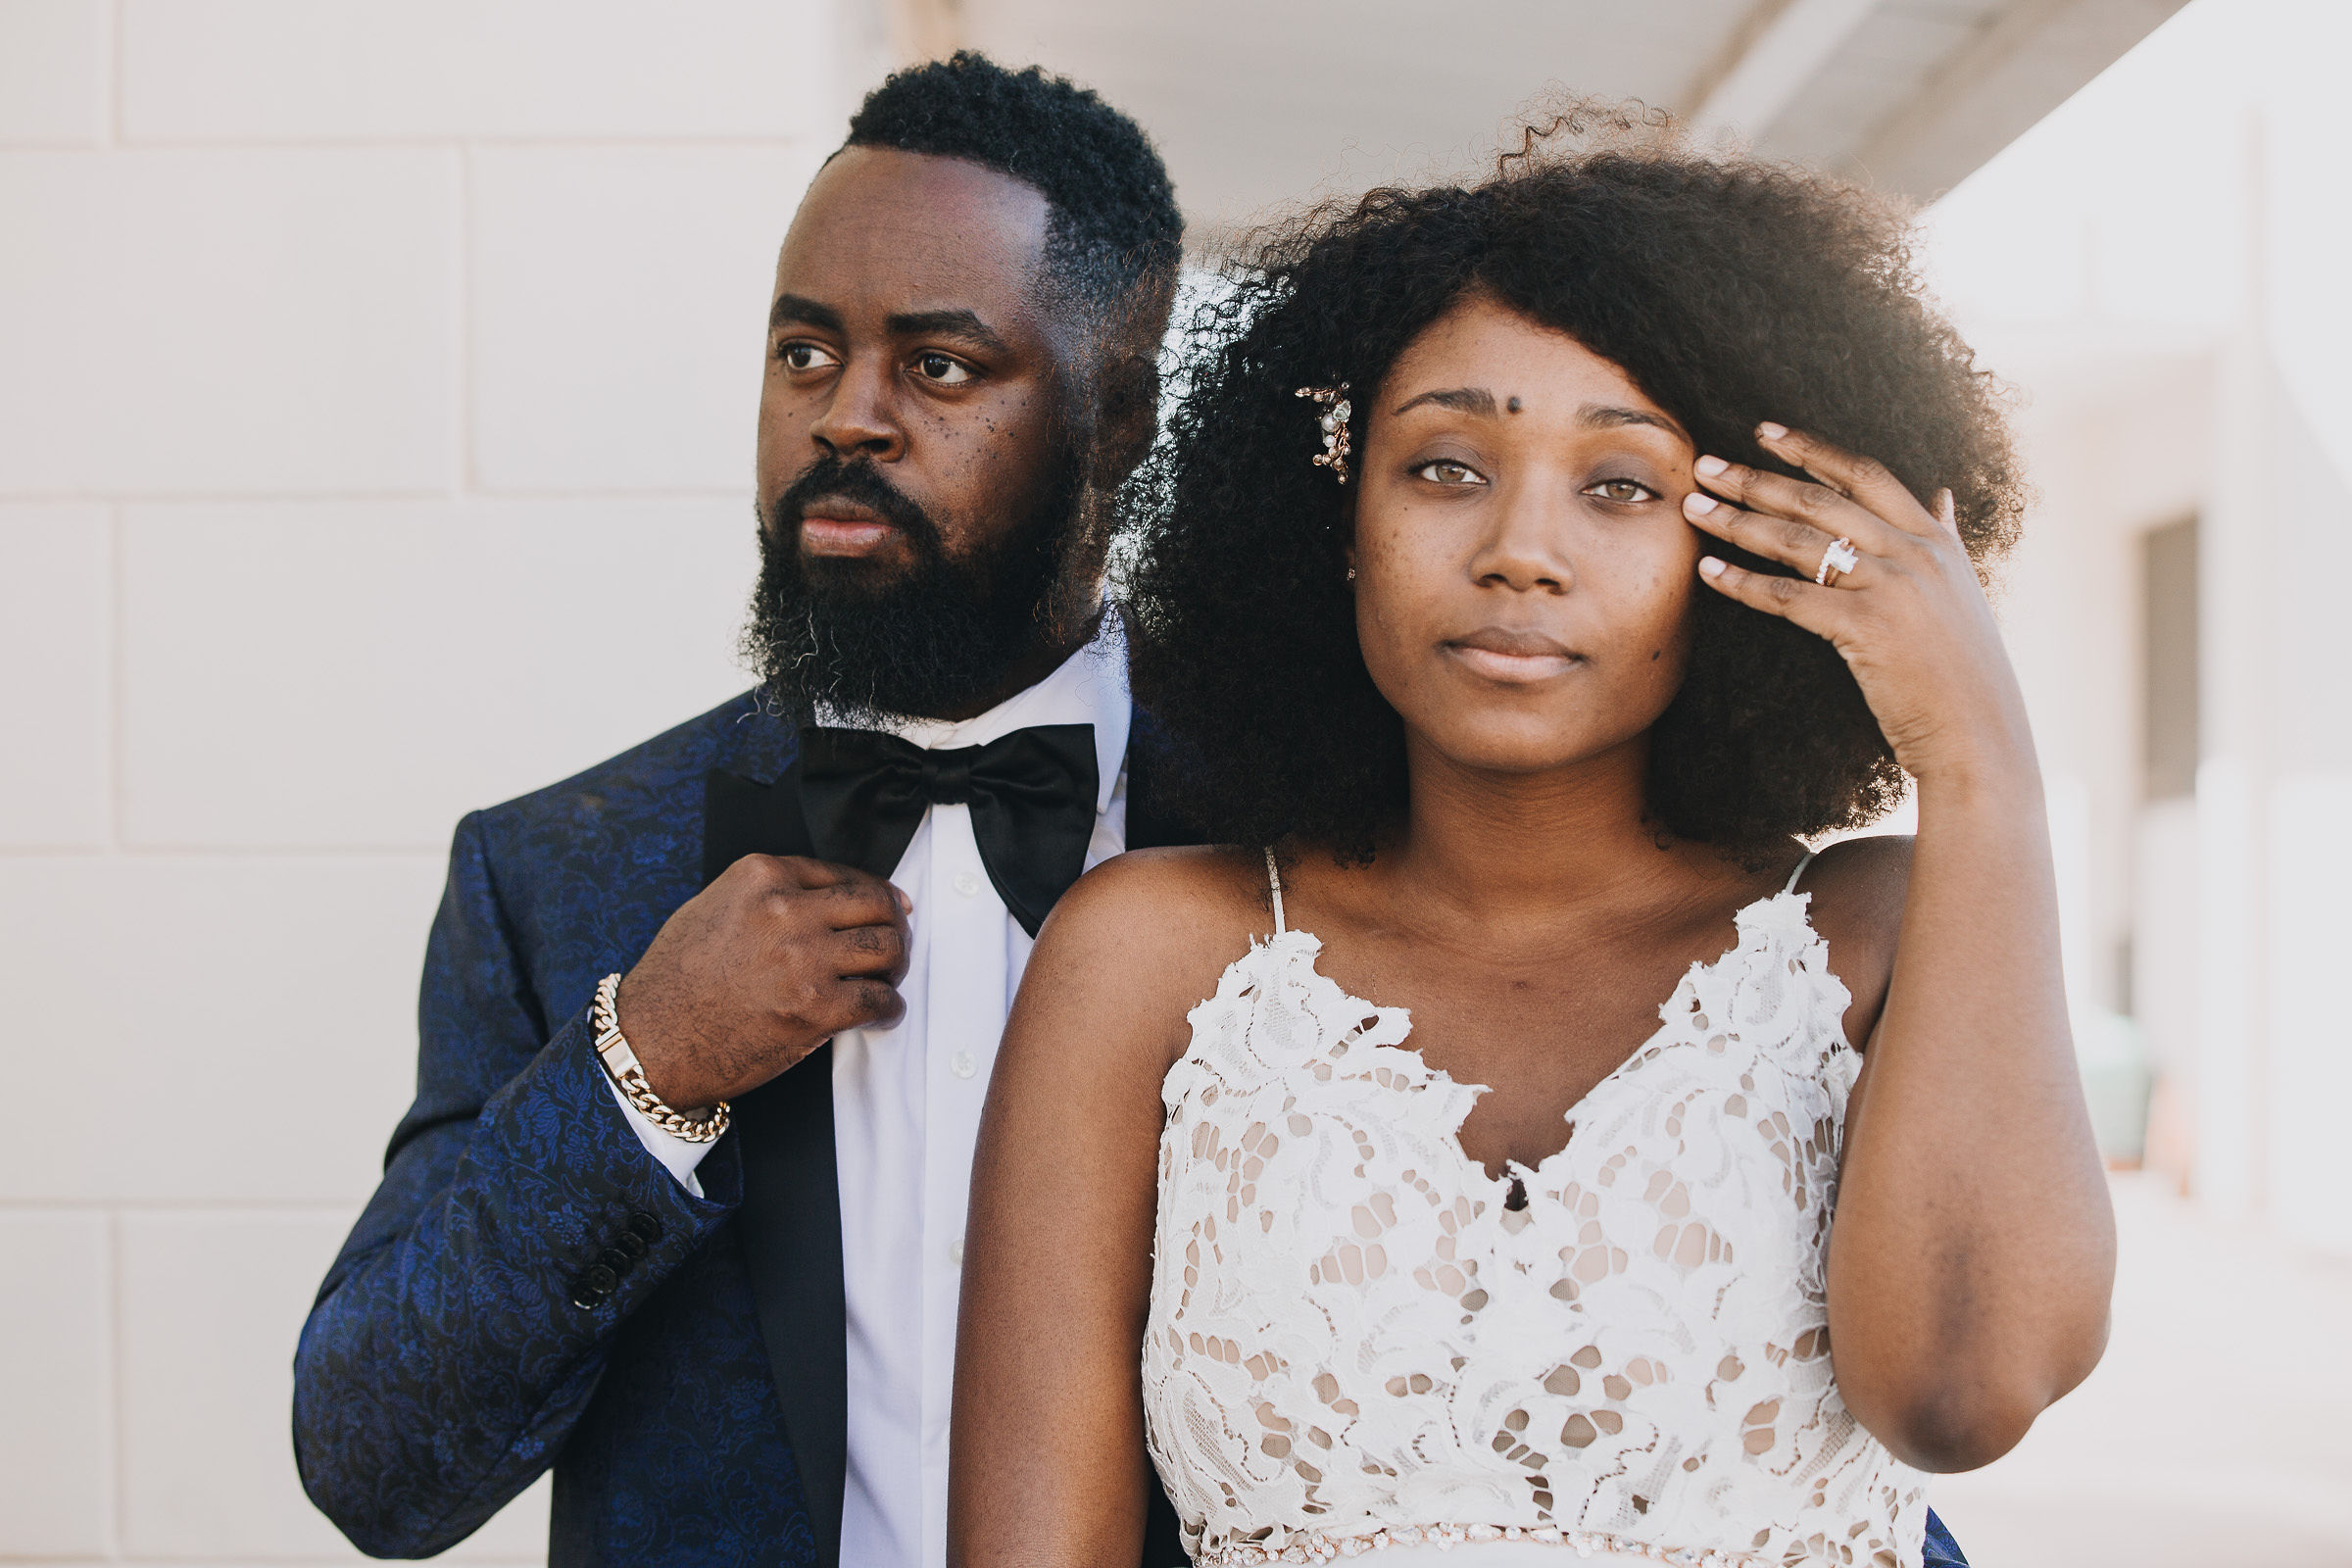 MAGO Wedding - PC: Marcia's Weddings